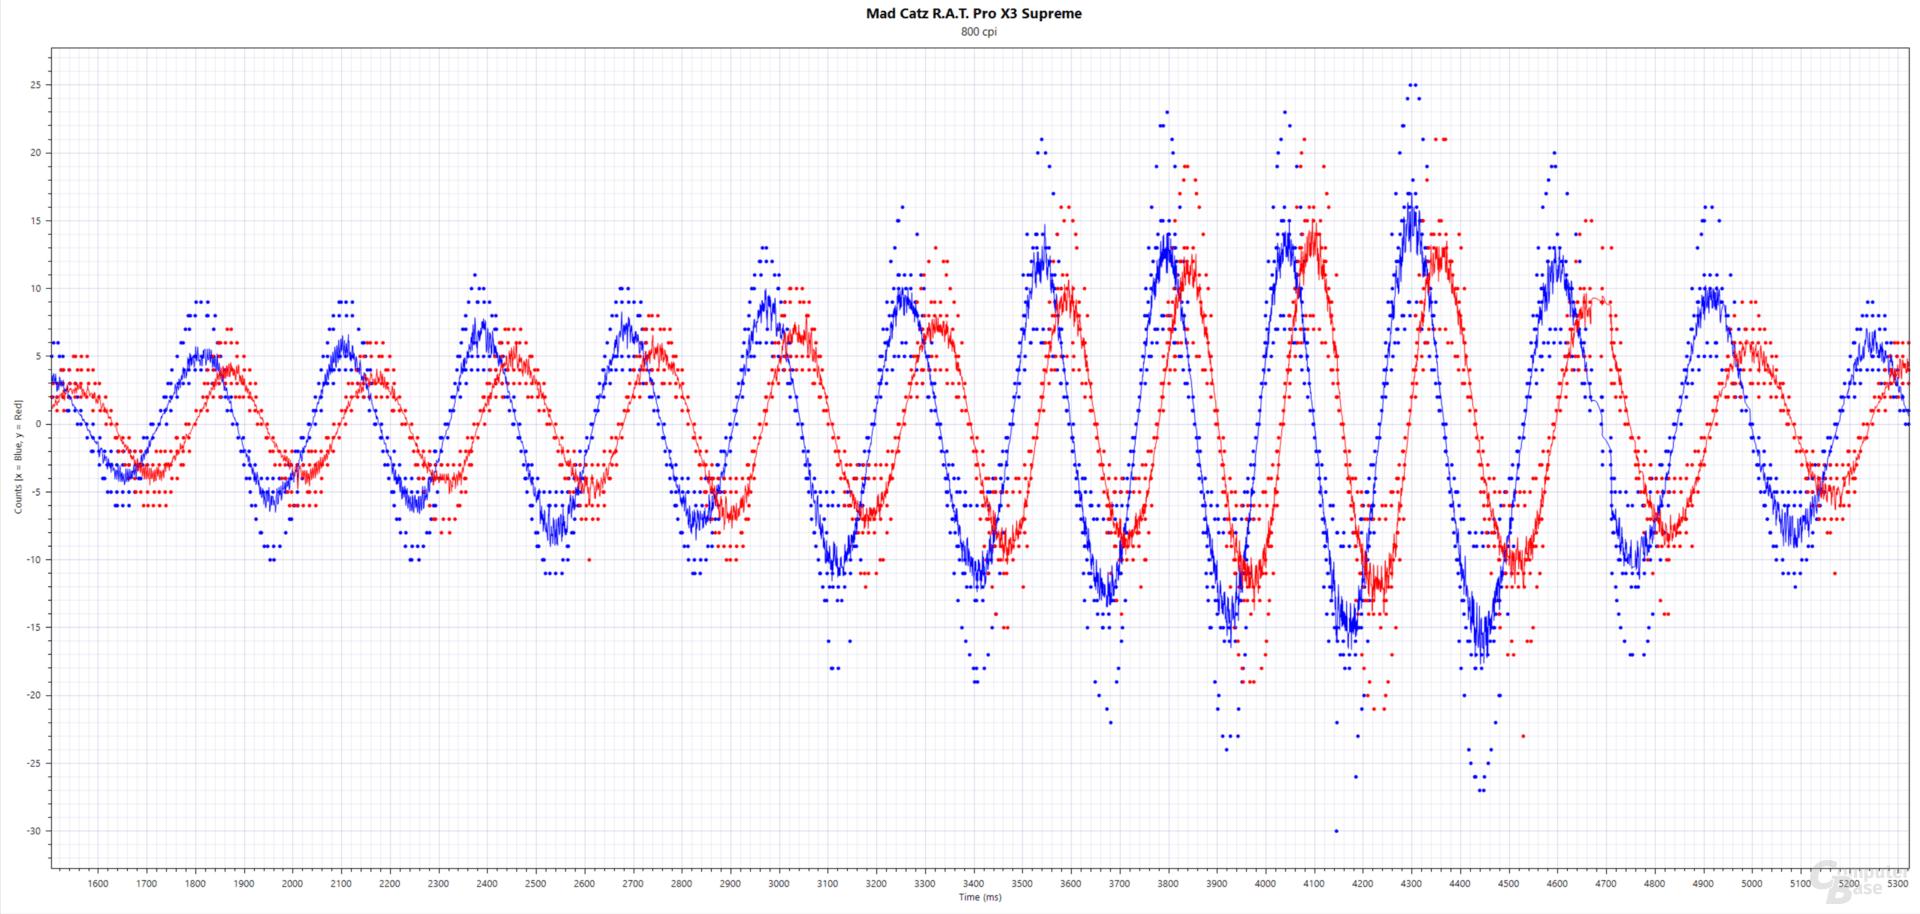 Blau: xCounts(ms), Rot: yCounts(ms); Mad Catz R.A.T. Pro X3 Supreme (PixArt PMW-3389, 800 cpi, 3.000 Hertz, Stoffmauspad)